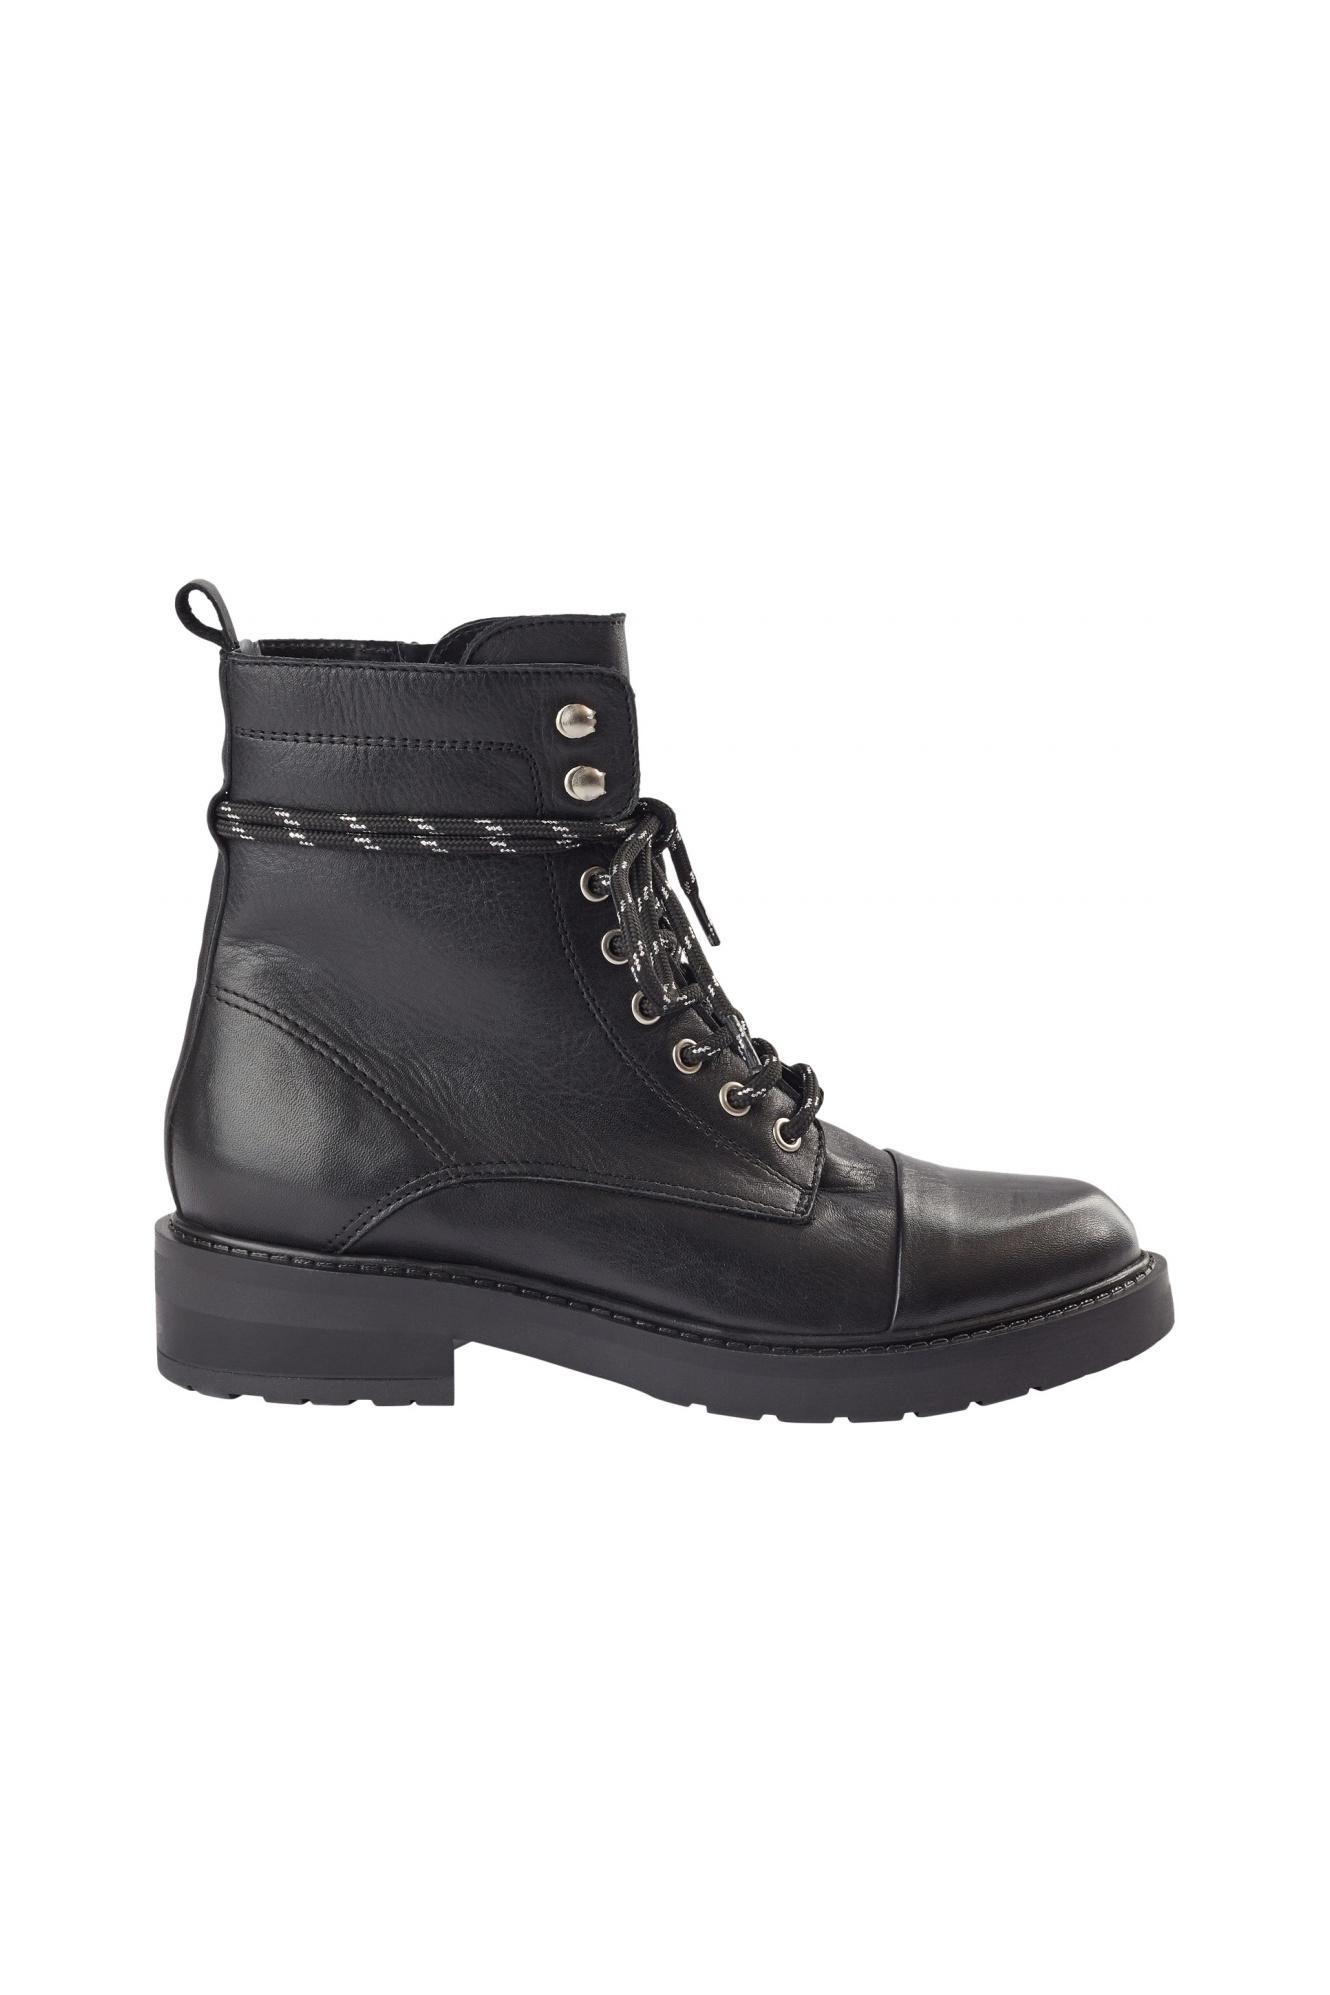 Charley Boot - Black-1